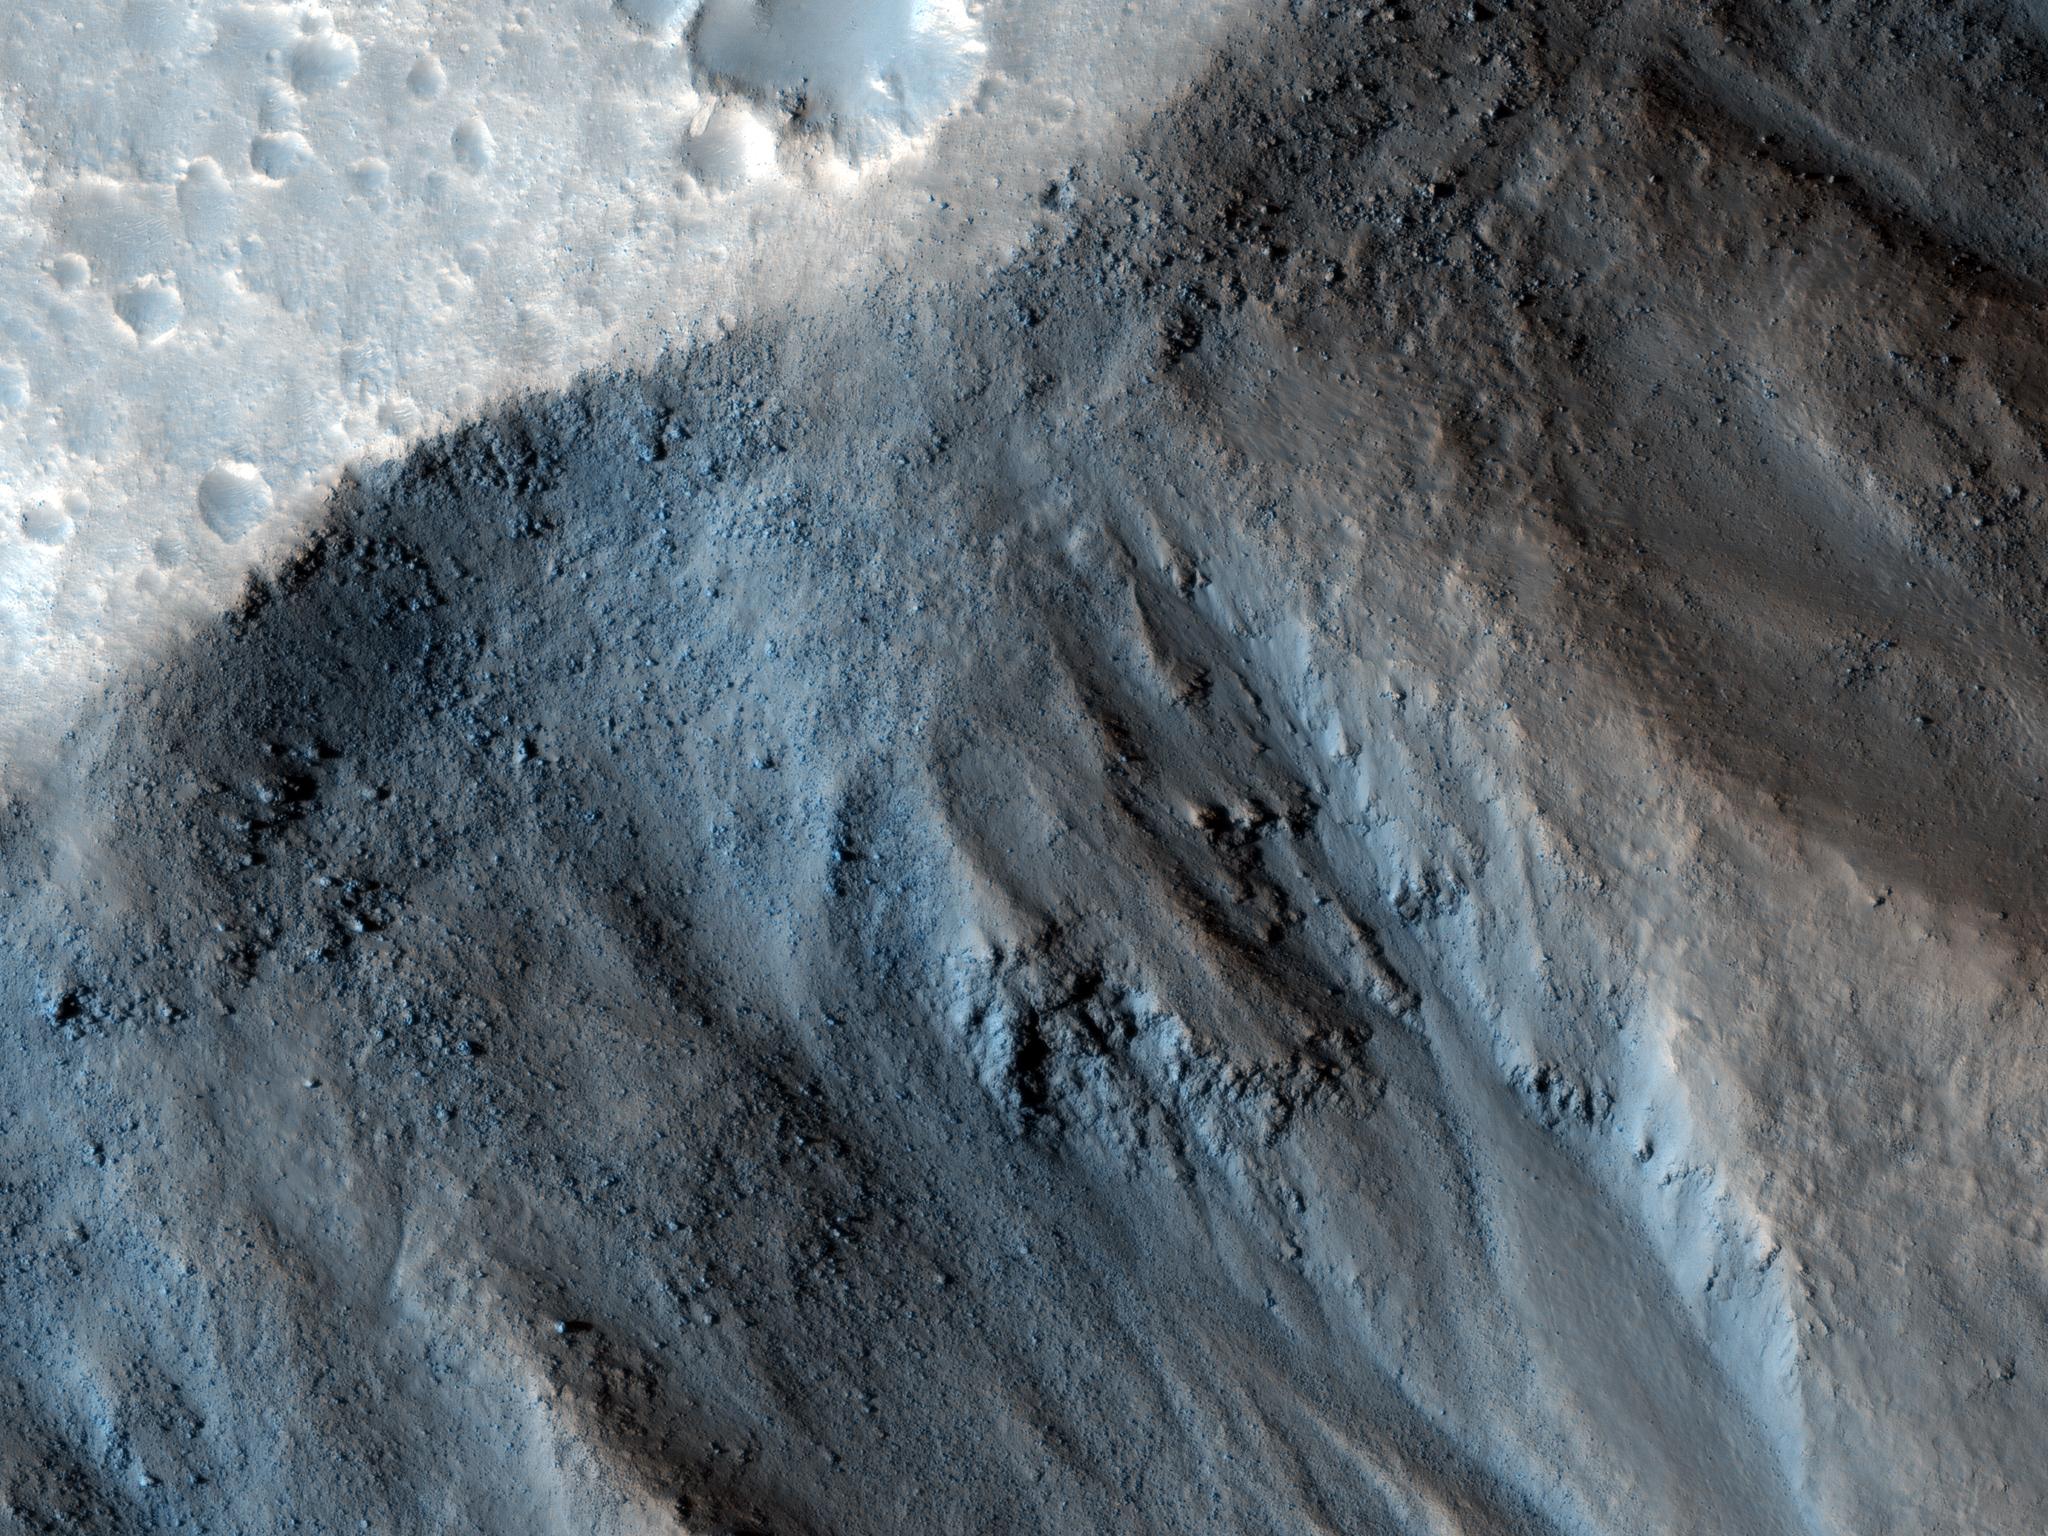 HiRISE | (Almost) Silent Rolling Stones in Kasei Valles ...